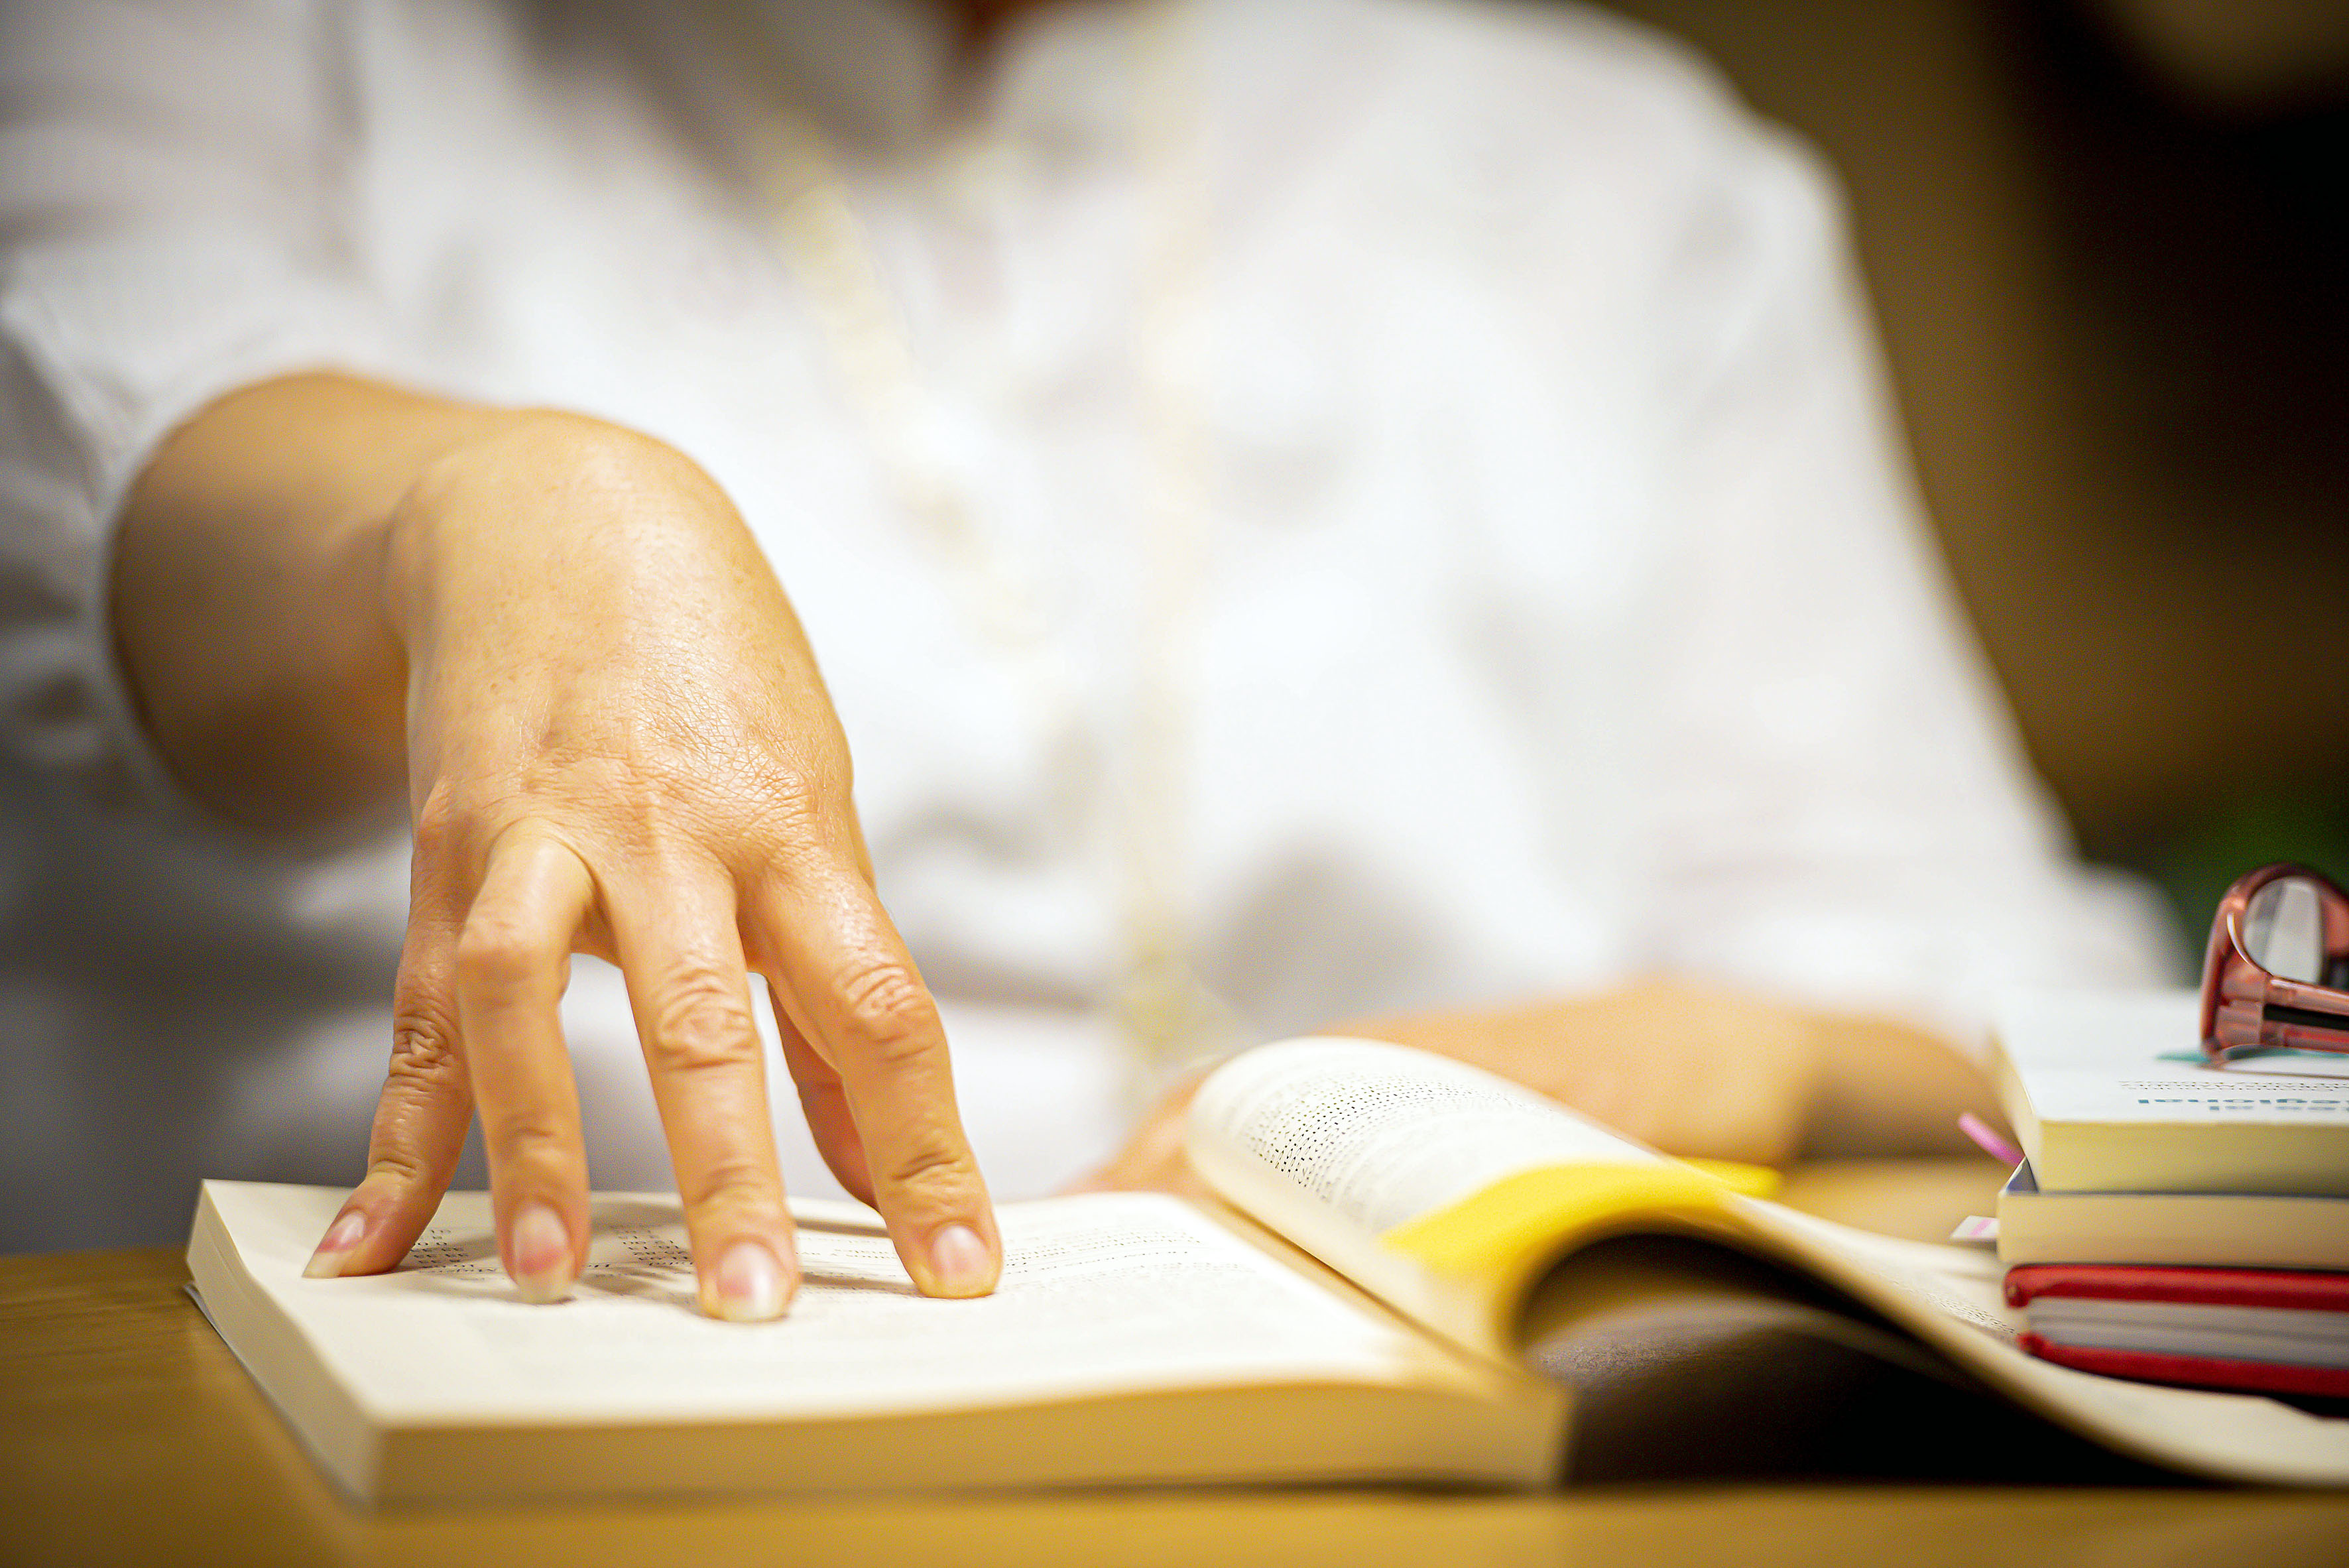 Mano femenina señalando un libro